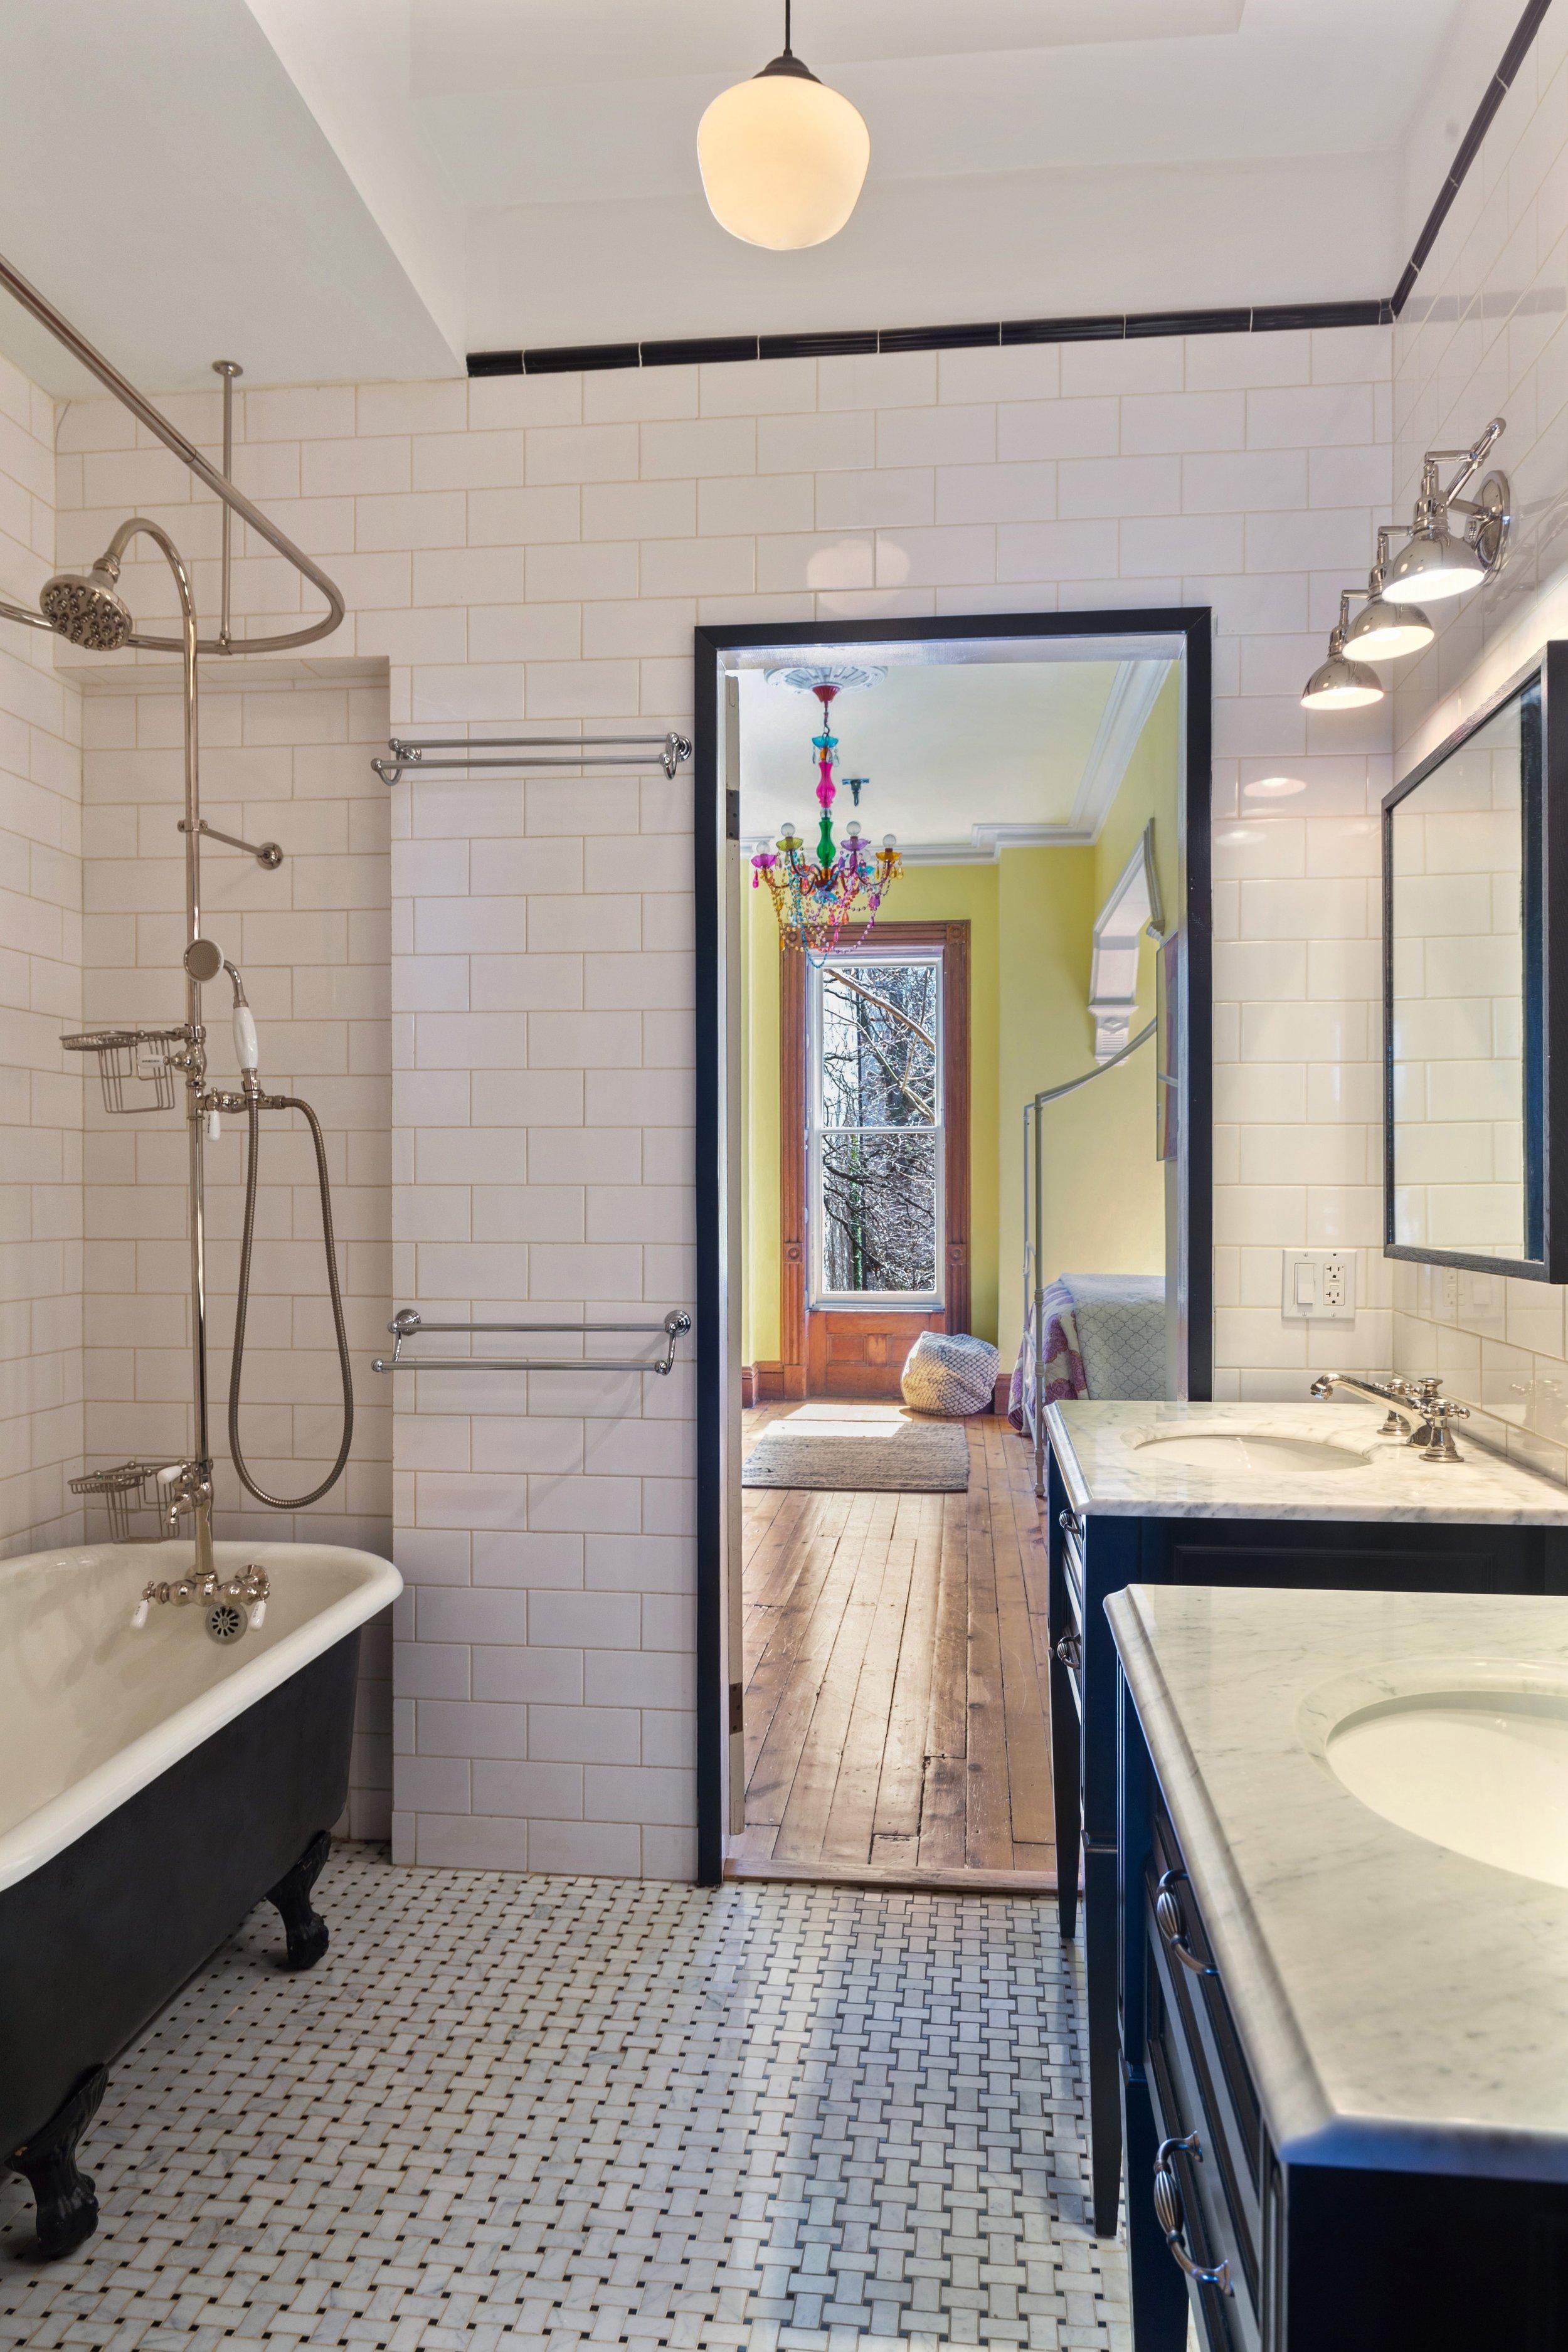 16_151WilloughbyAve_323_Bathroom_HiRes.jpg